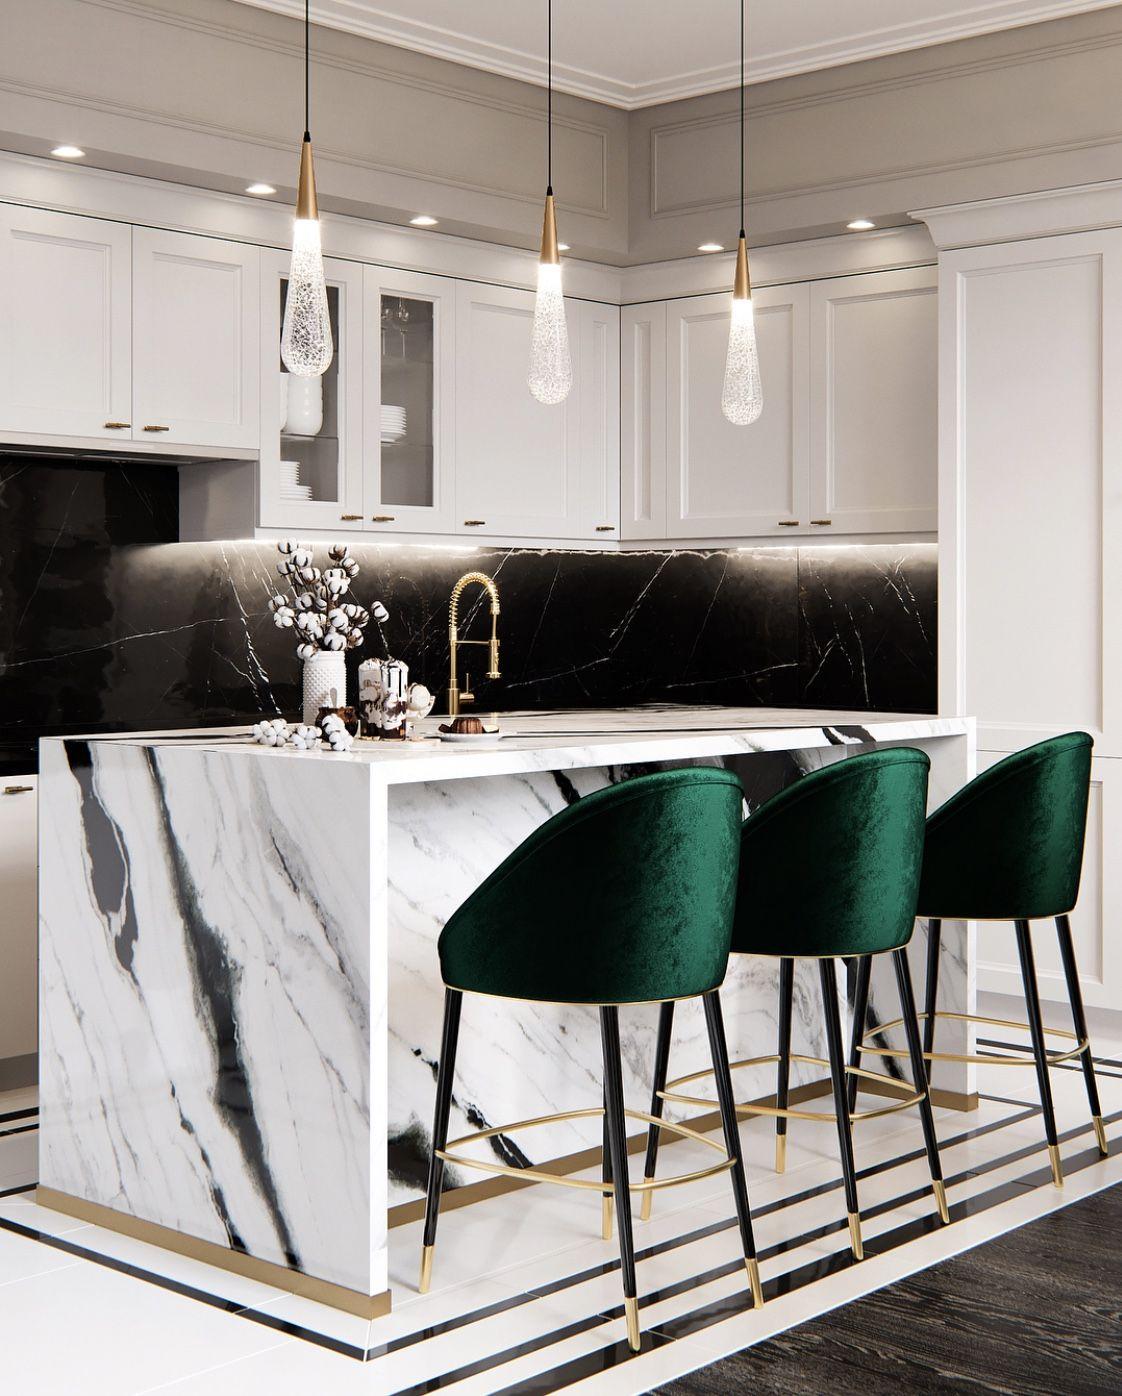 Emerald Marble Kitchen Decor Modern Home Interior Design Home Decor Kitchen